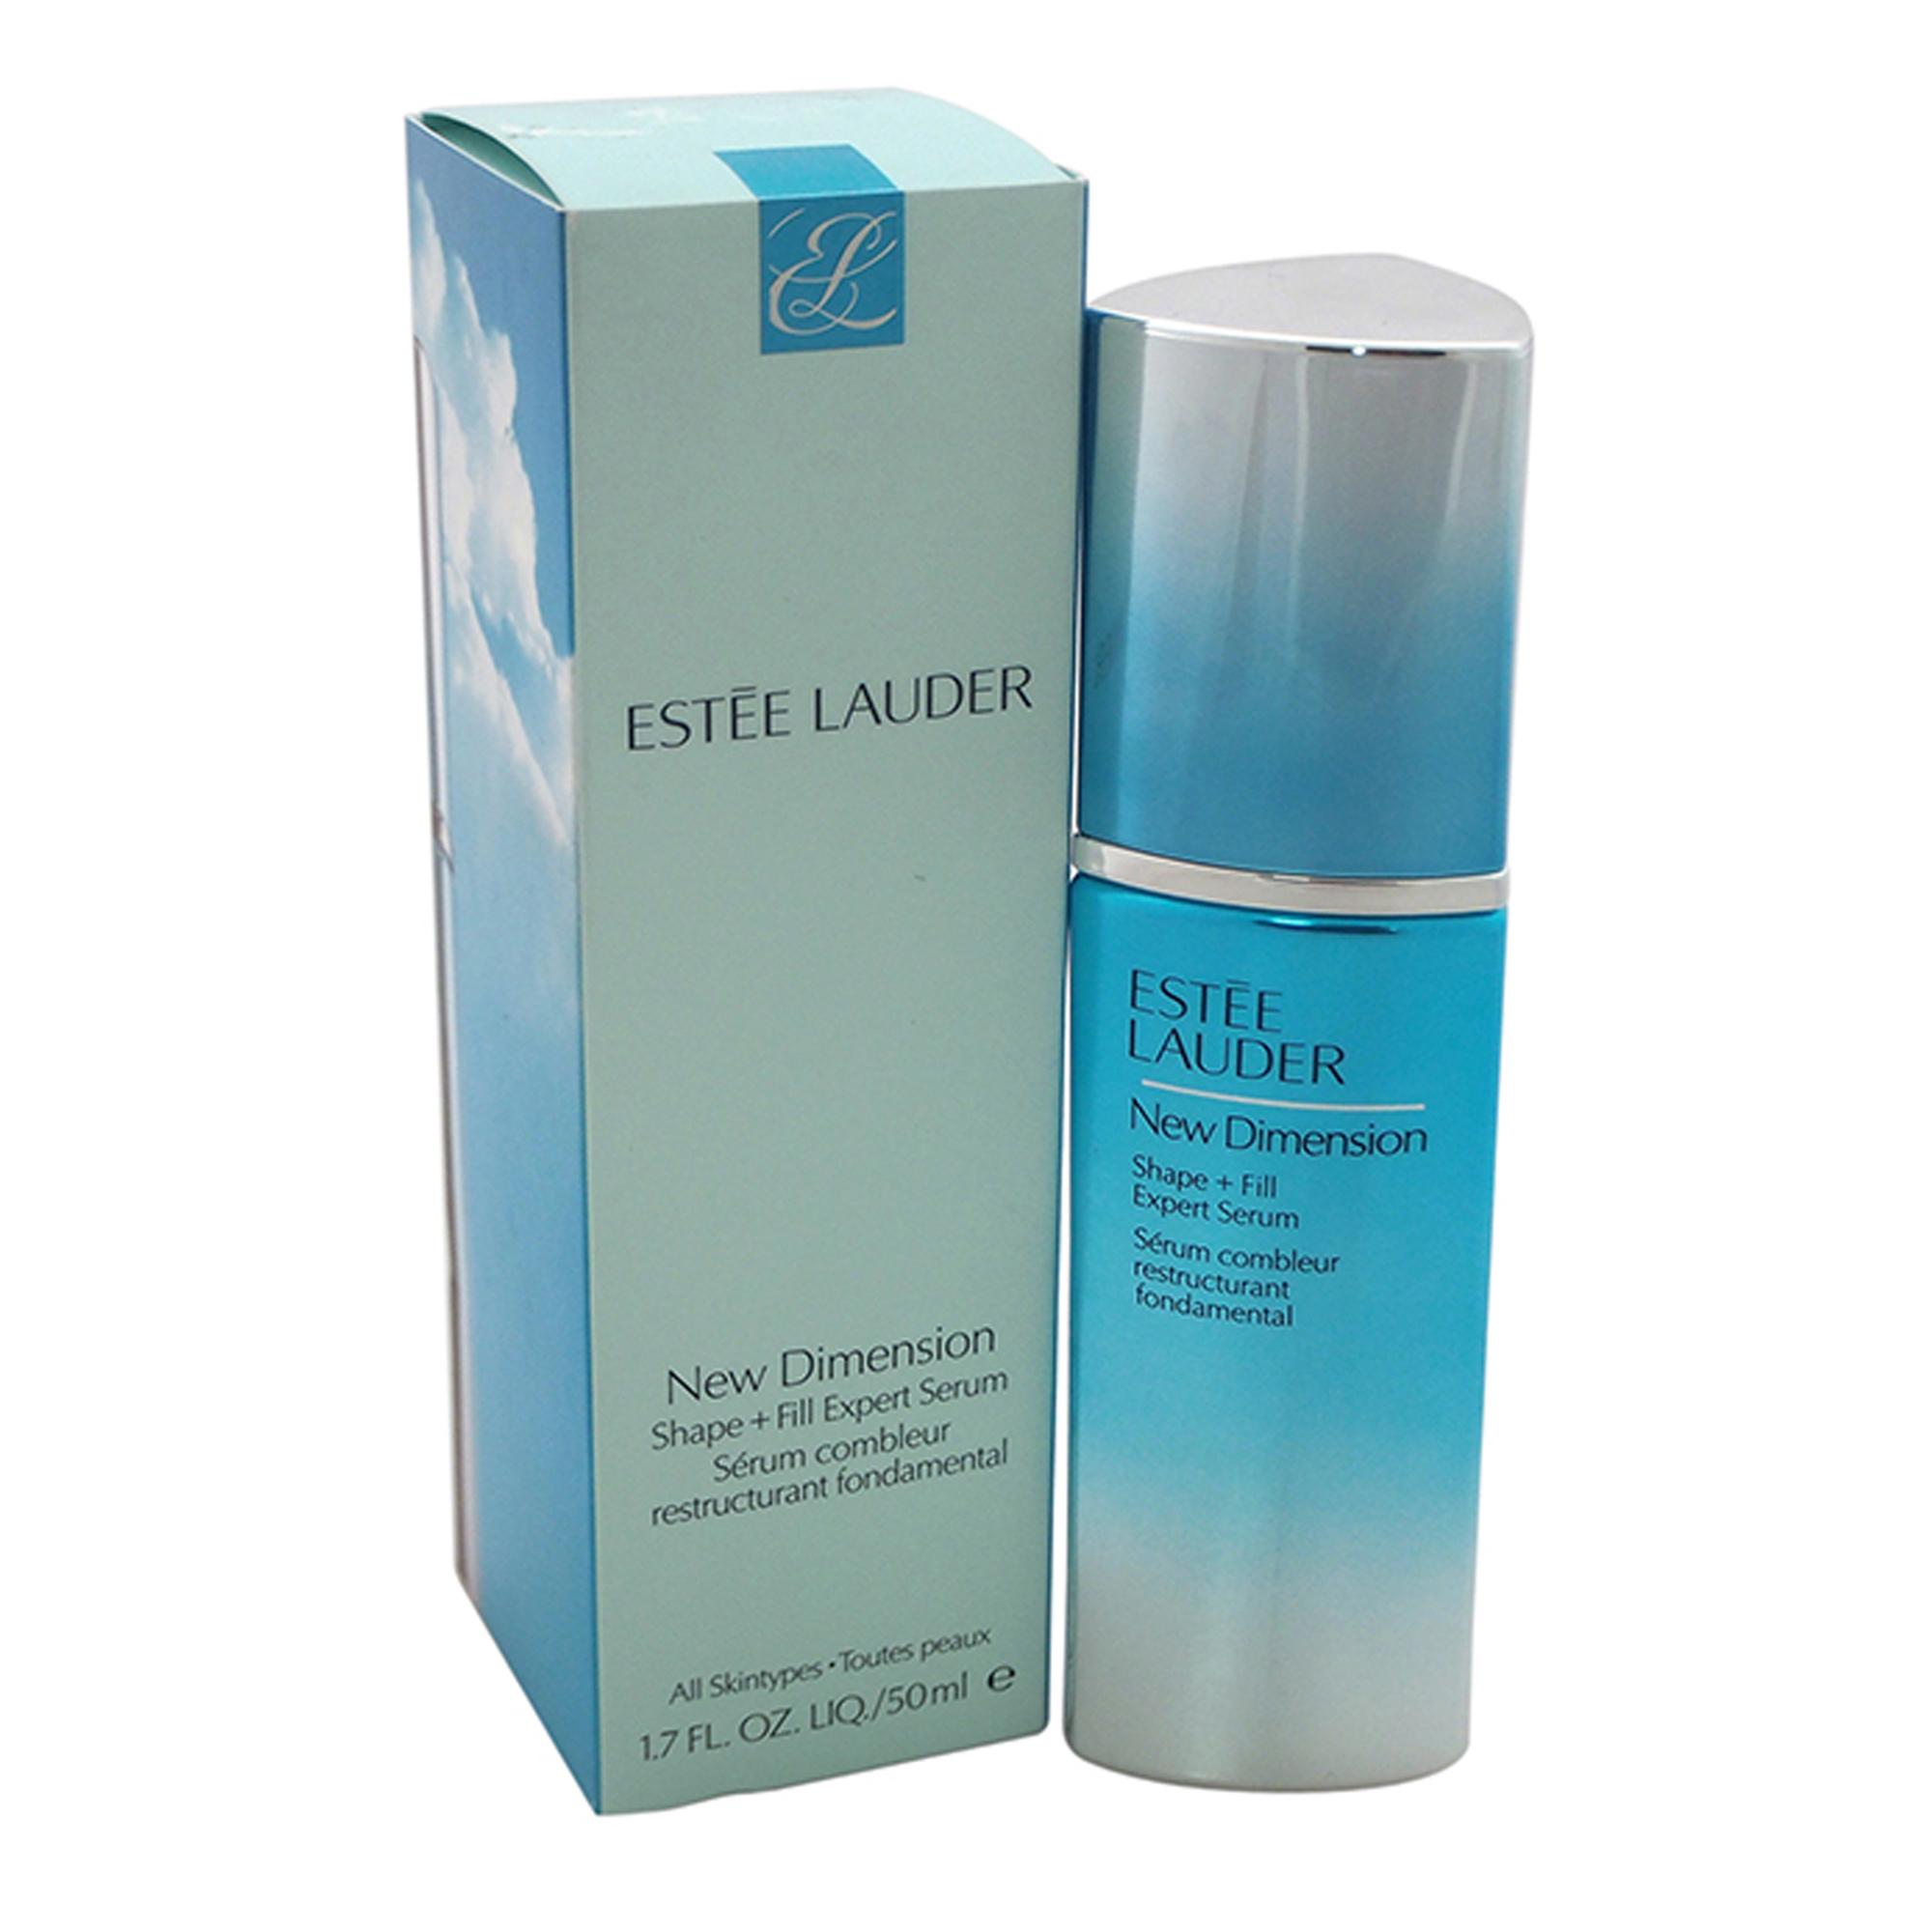 New Dimension Shape + Fill Expert Serum - All Skin Types by Estee Lauder for Women - 1.7 oz Serum